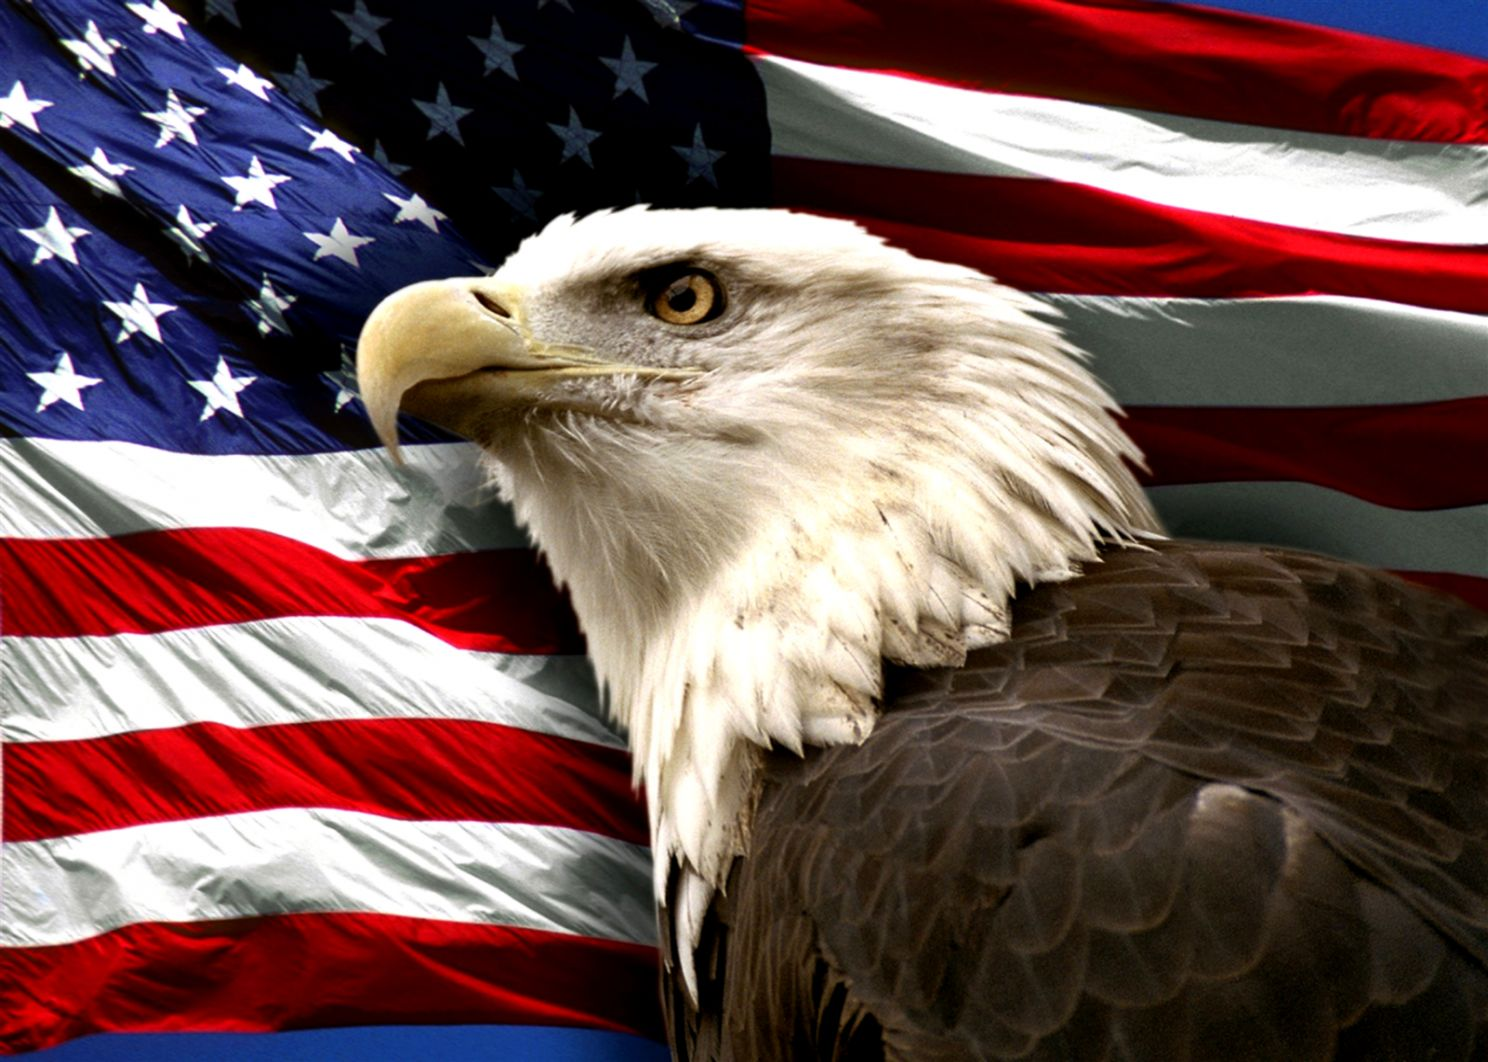 Patriotic Bald Eagle Wallpaper Pack Wallpapers